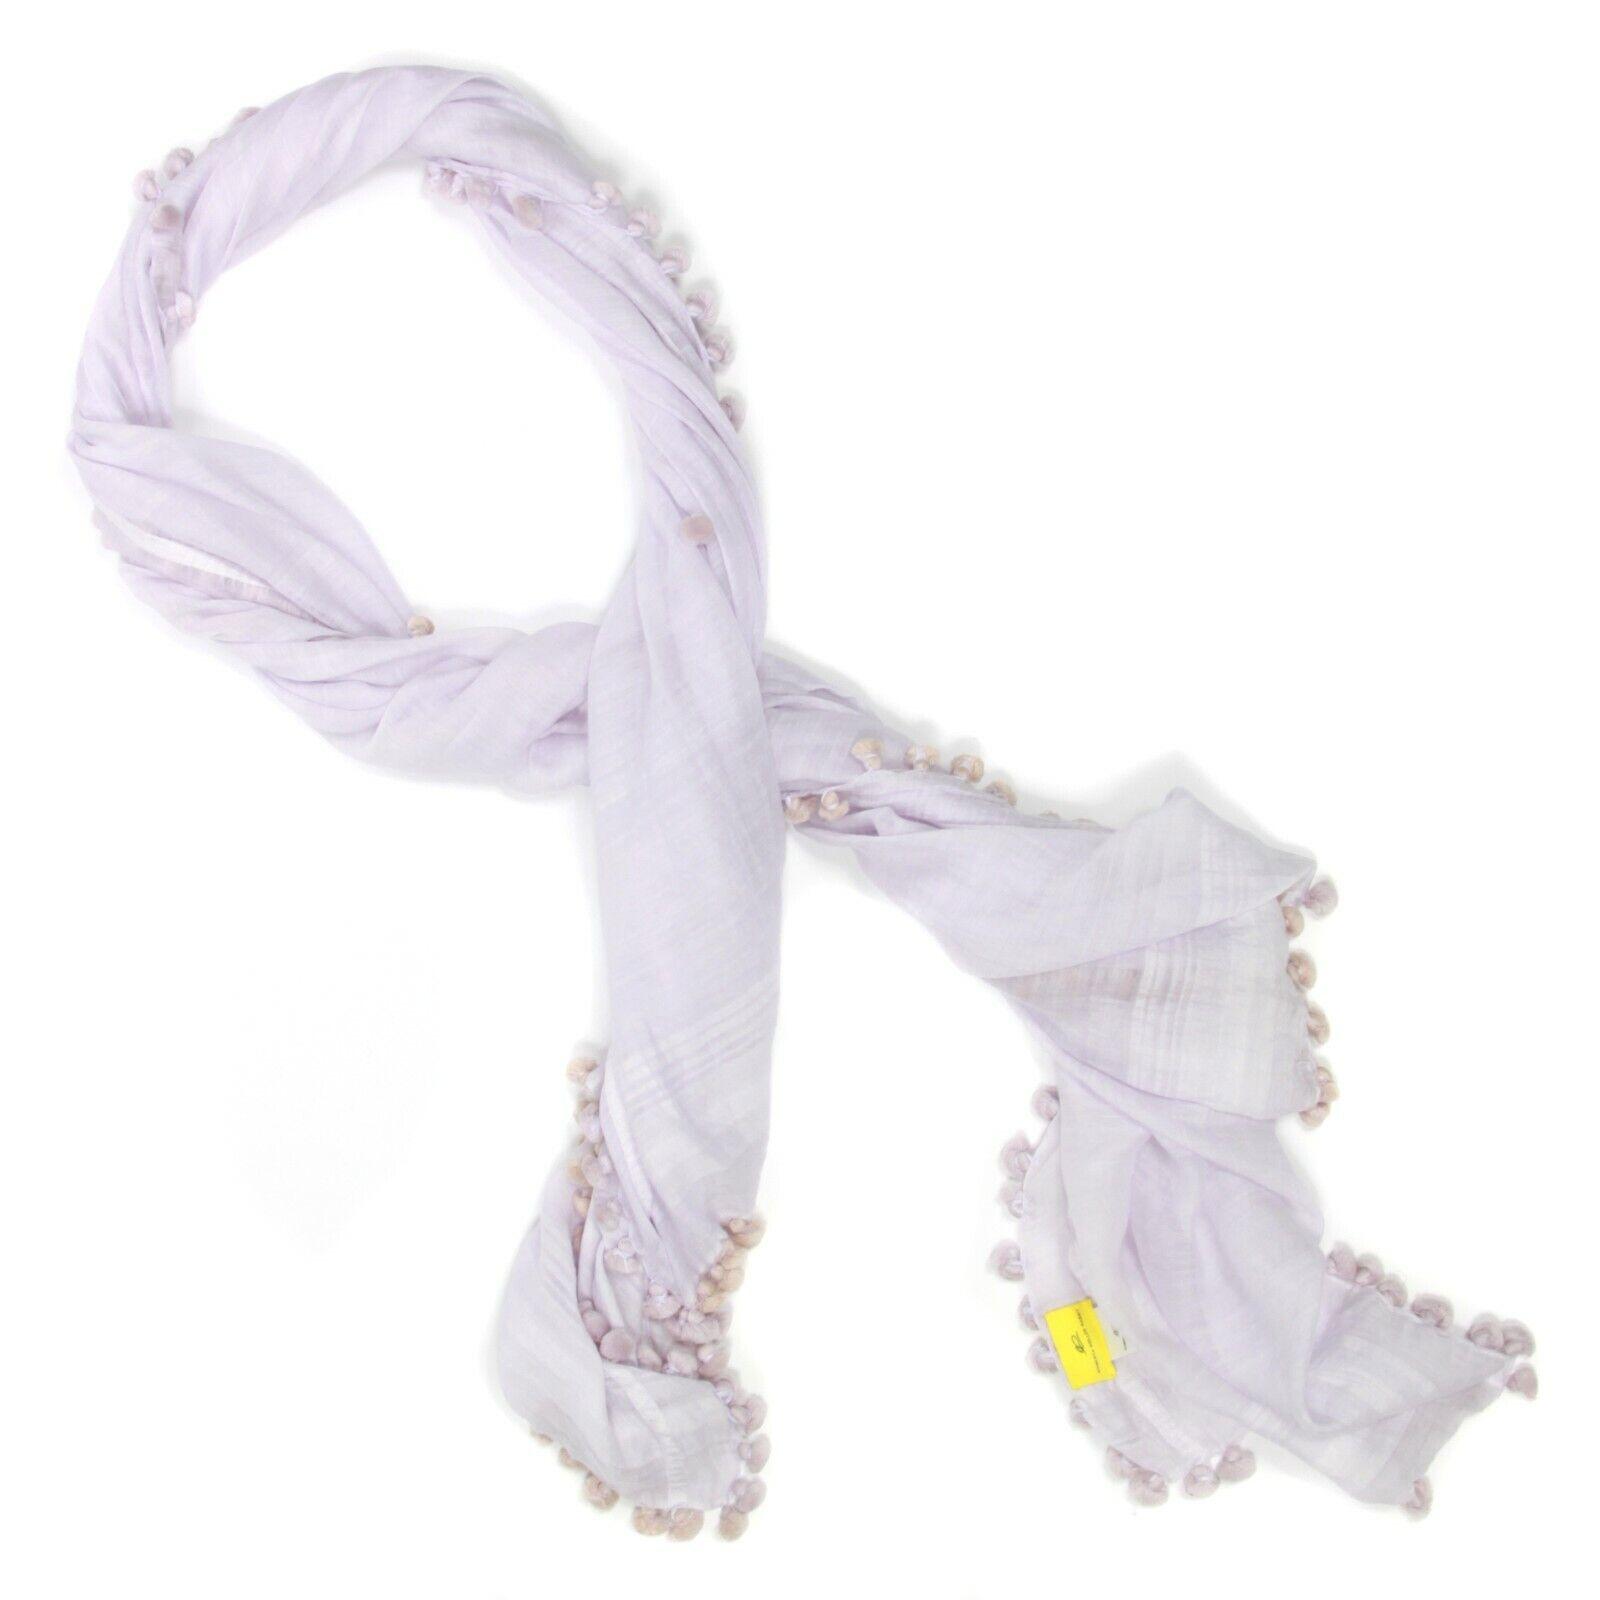 Roberta Roller Rabbit Lovely Lavender Sheer Scarf Wrap with Pom Pom Trim - 951